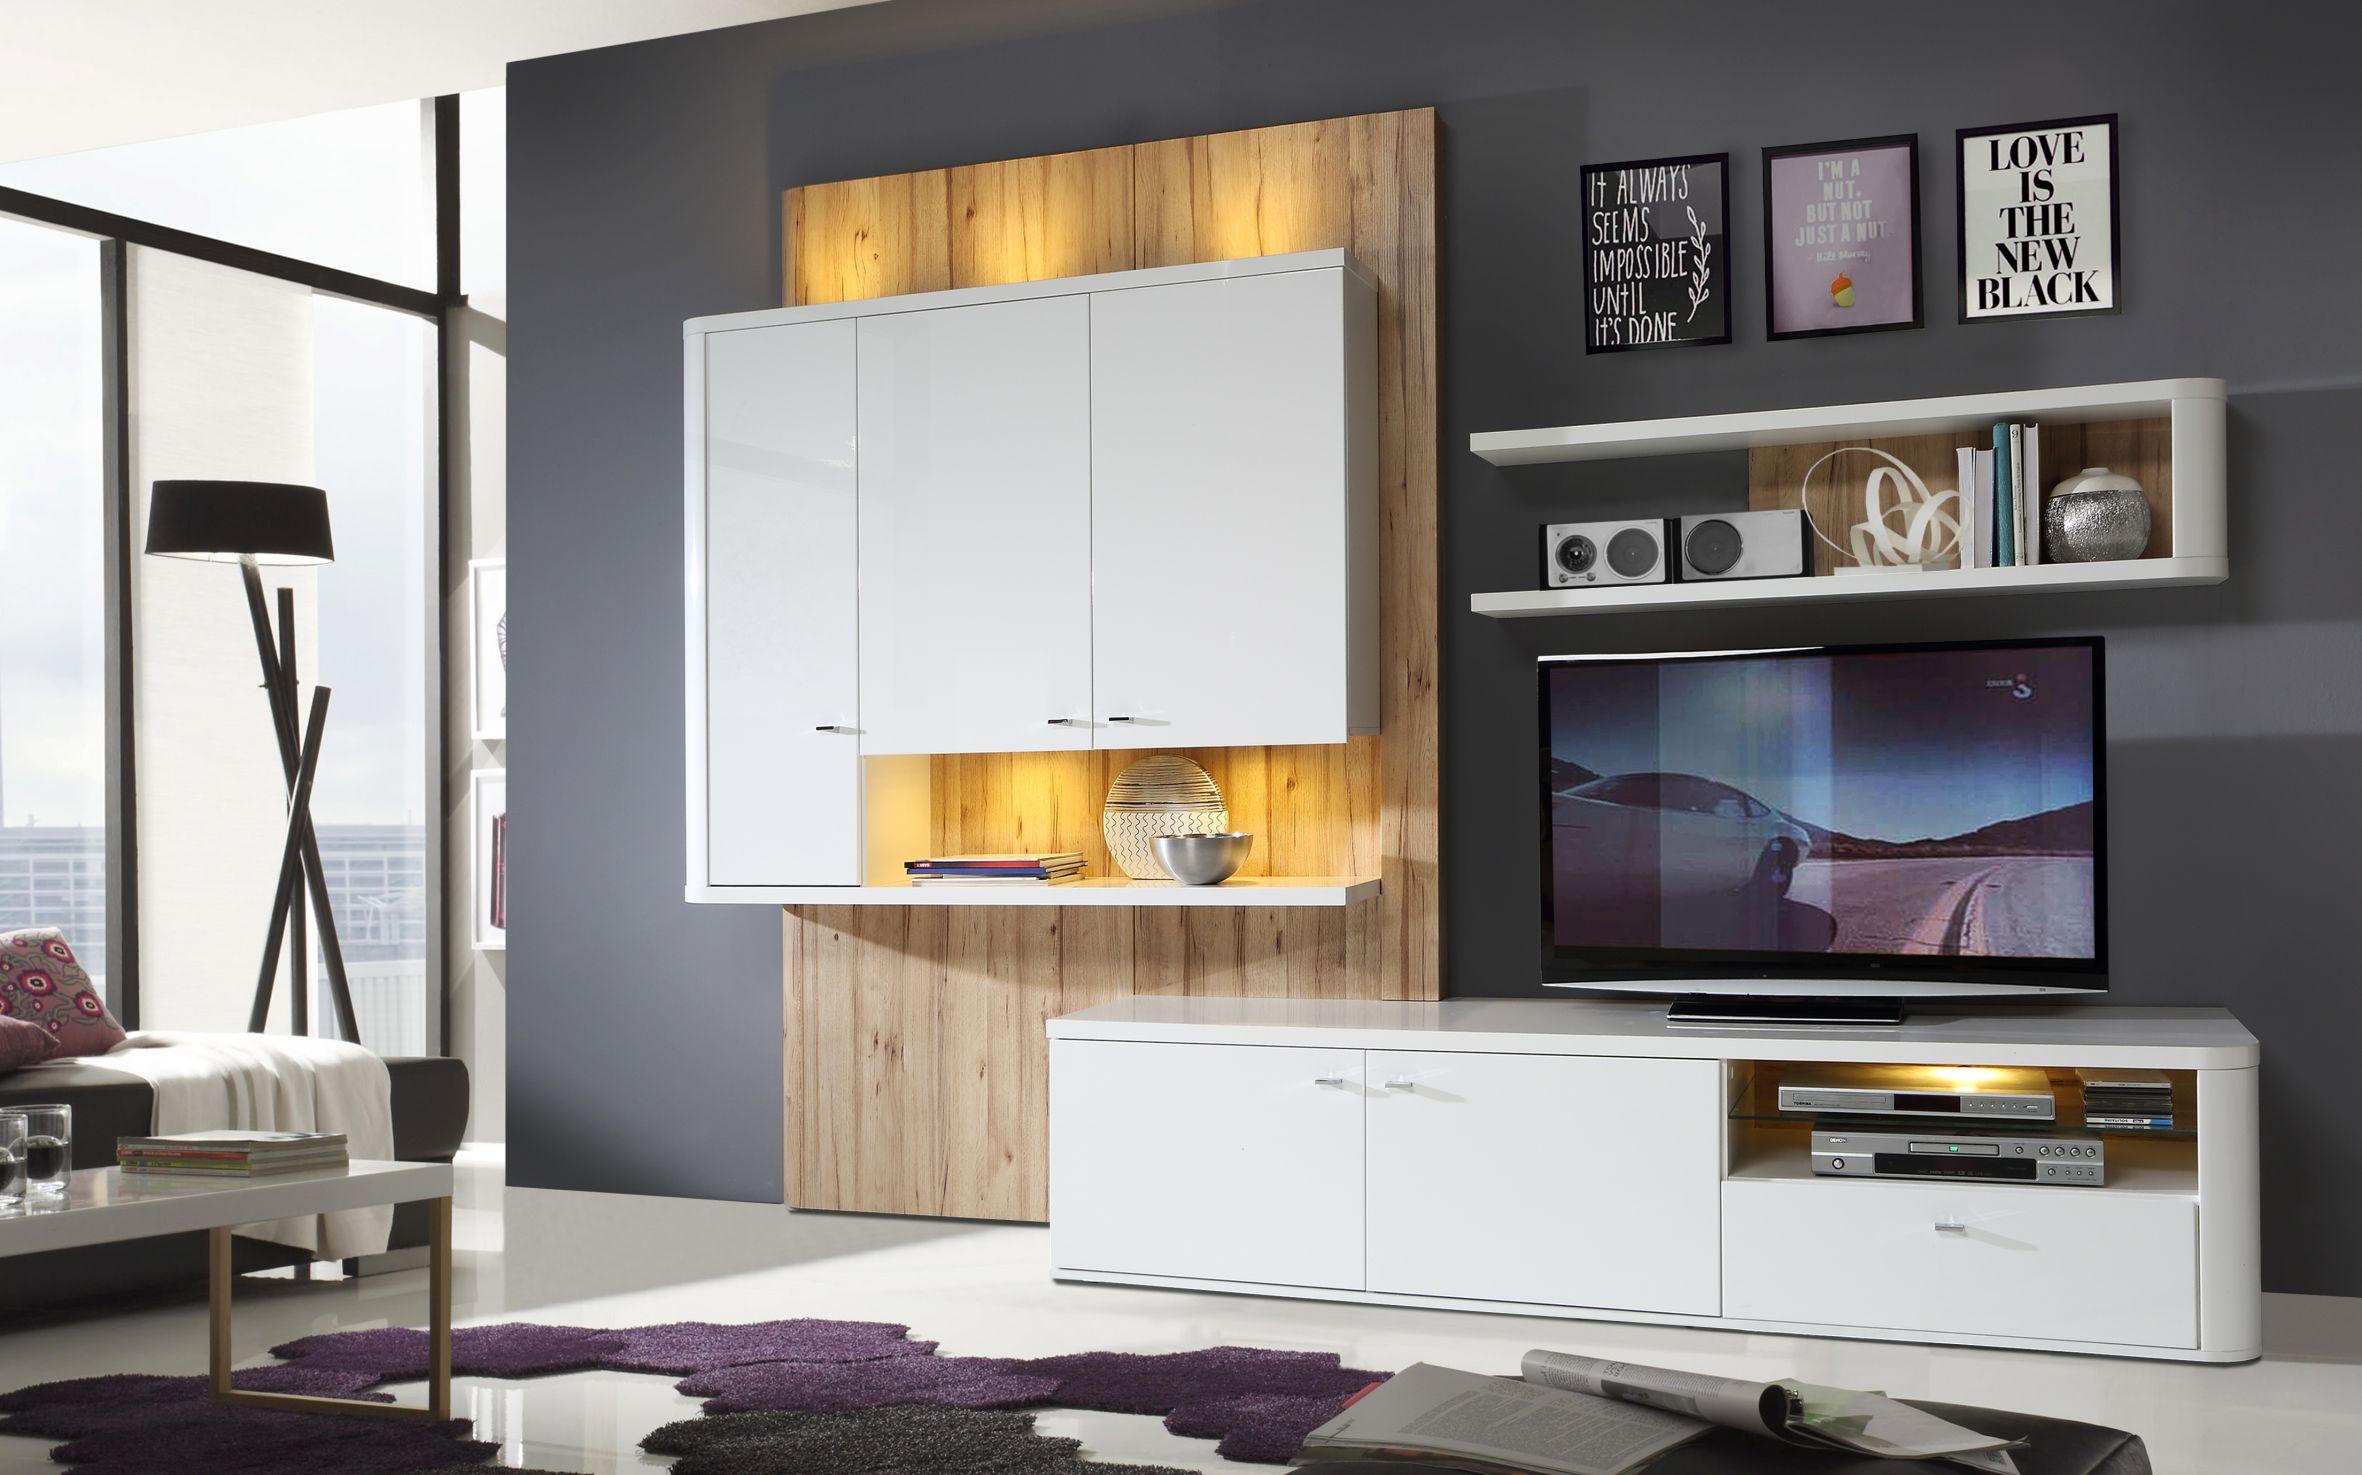 Wohnzimmer Marlow Wohnwand inkl LED Beleuchtung